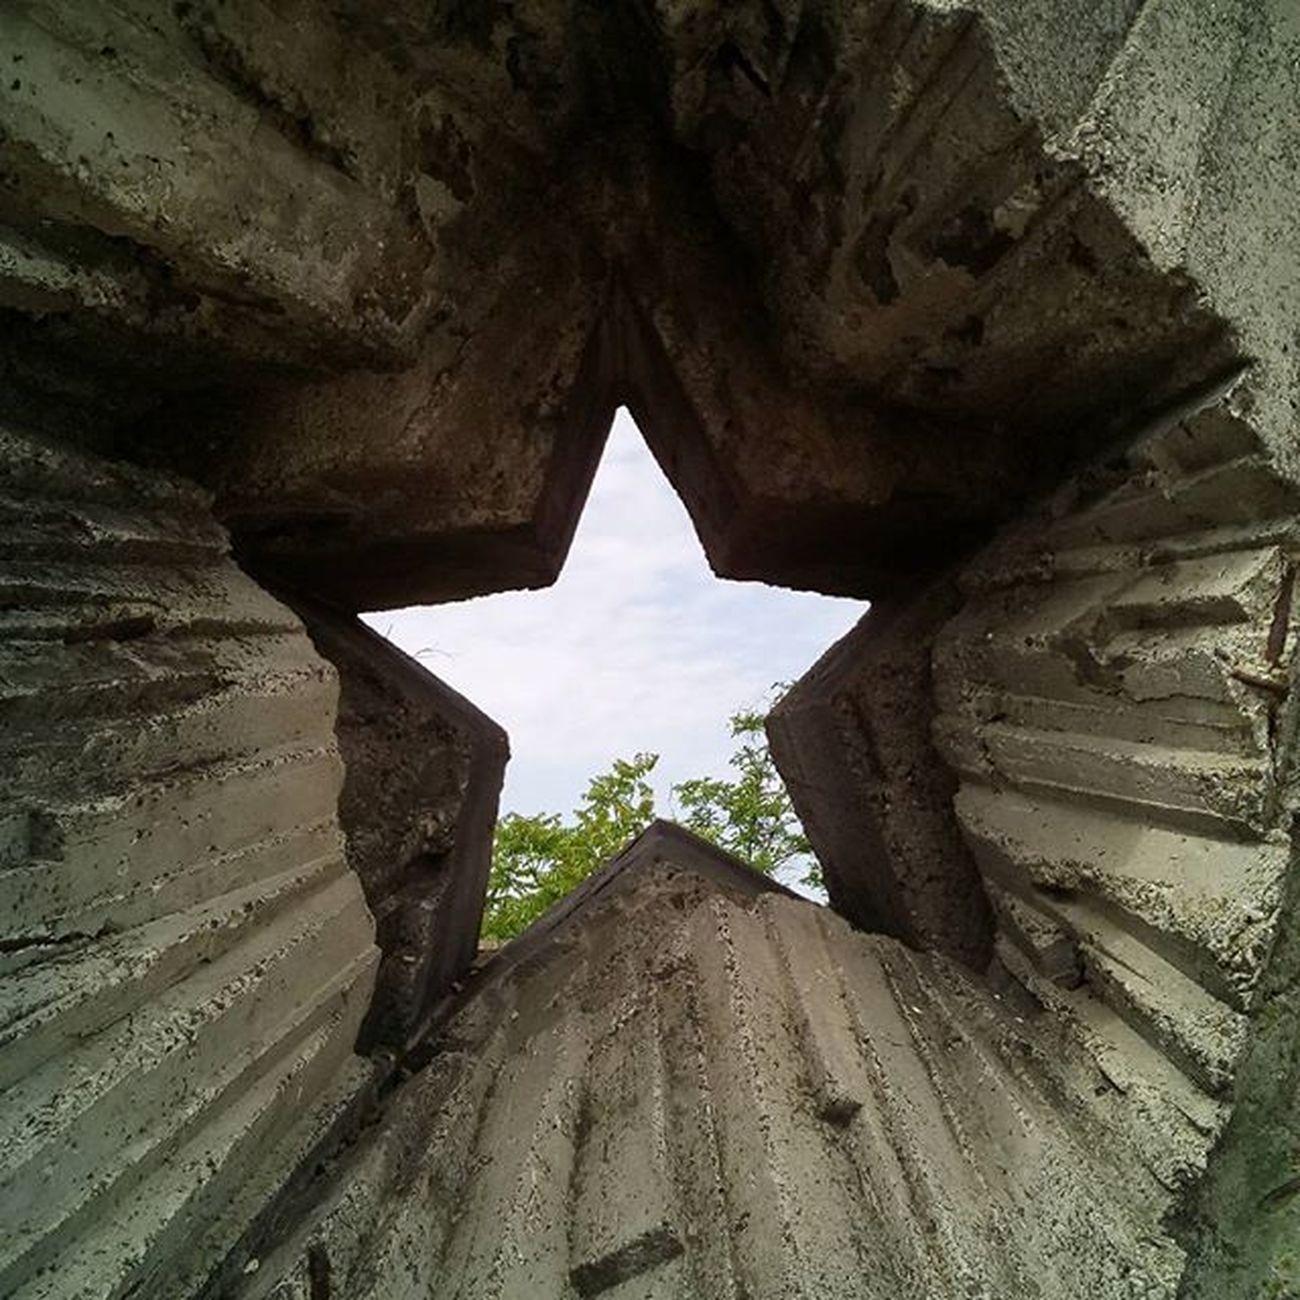 Star Lightattheendofthetunnel Fényazalagútvégén